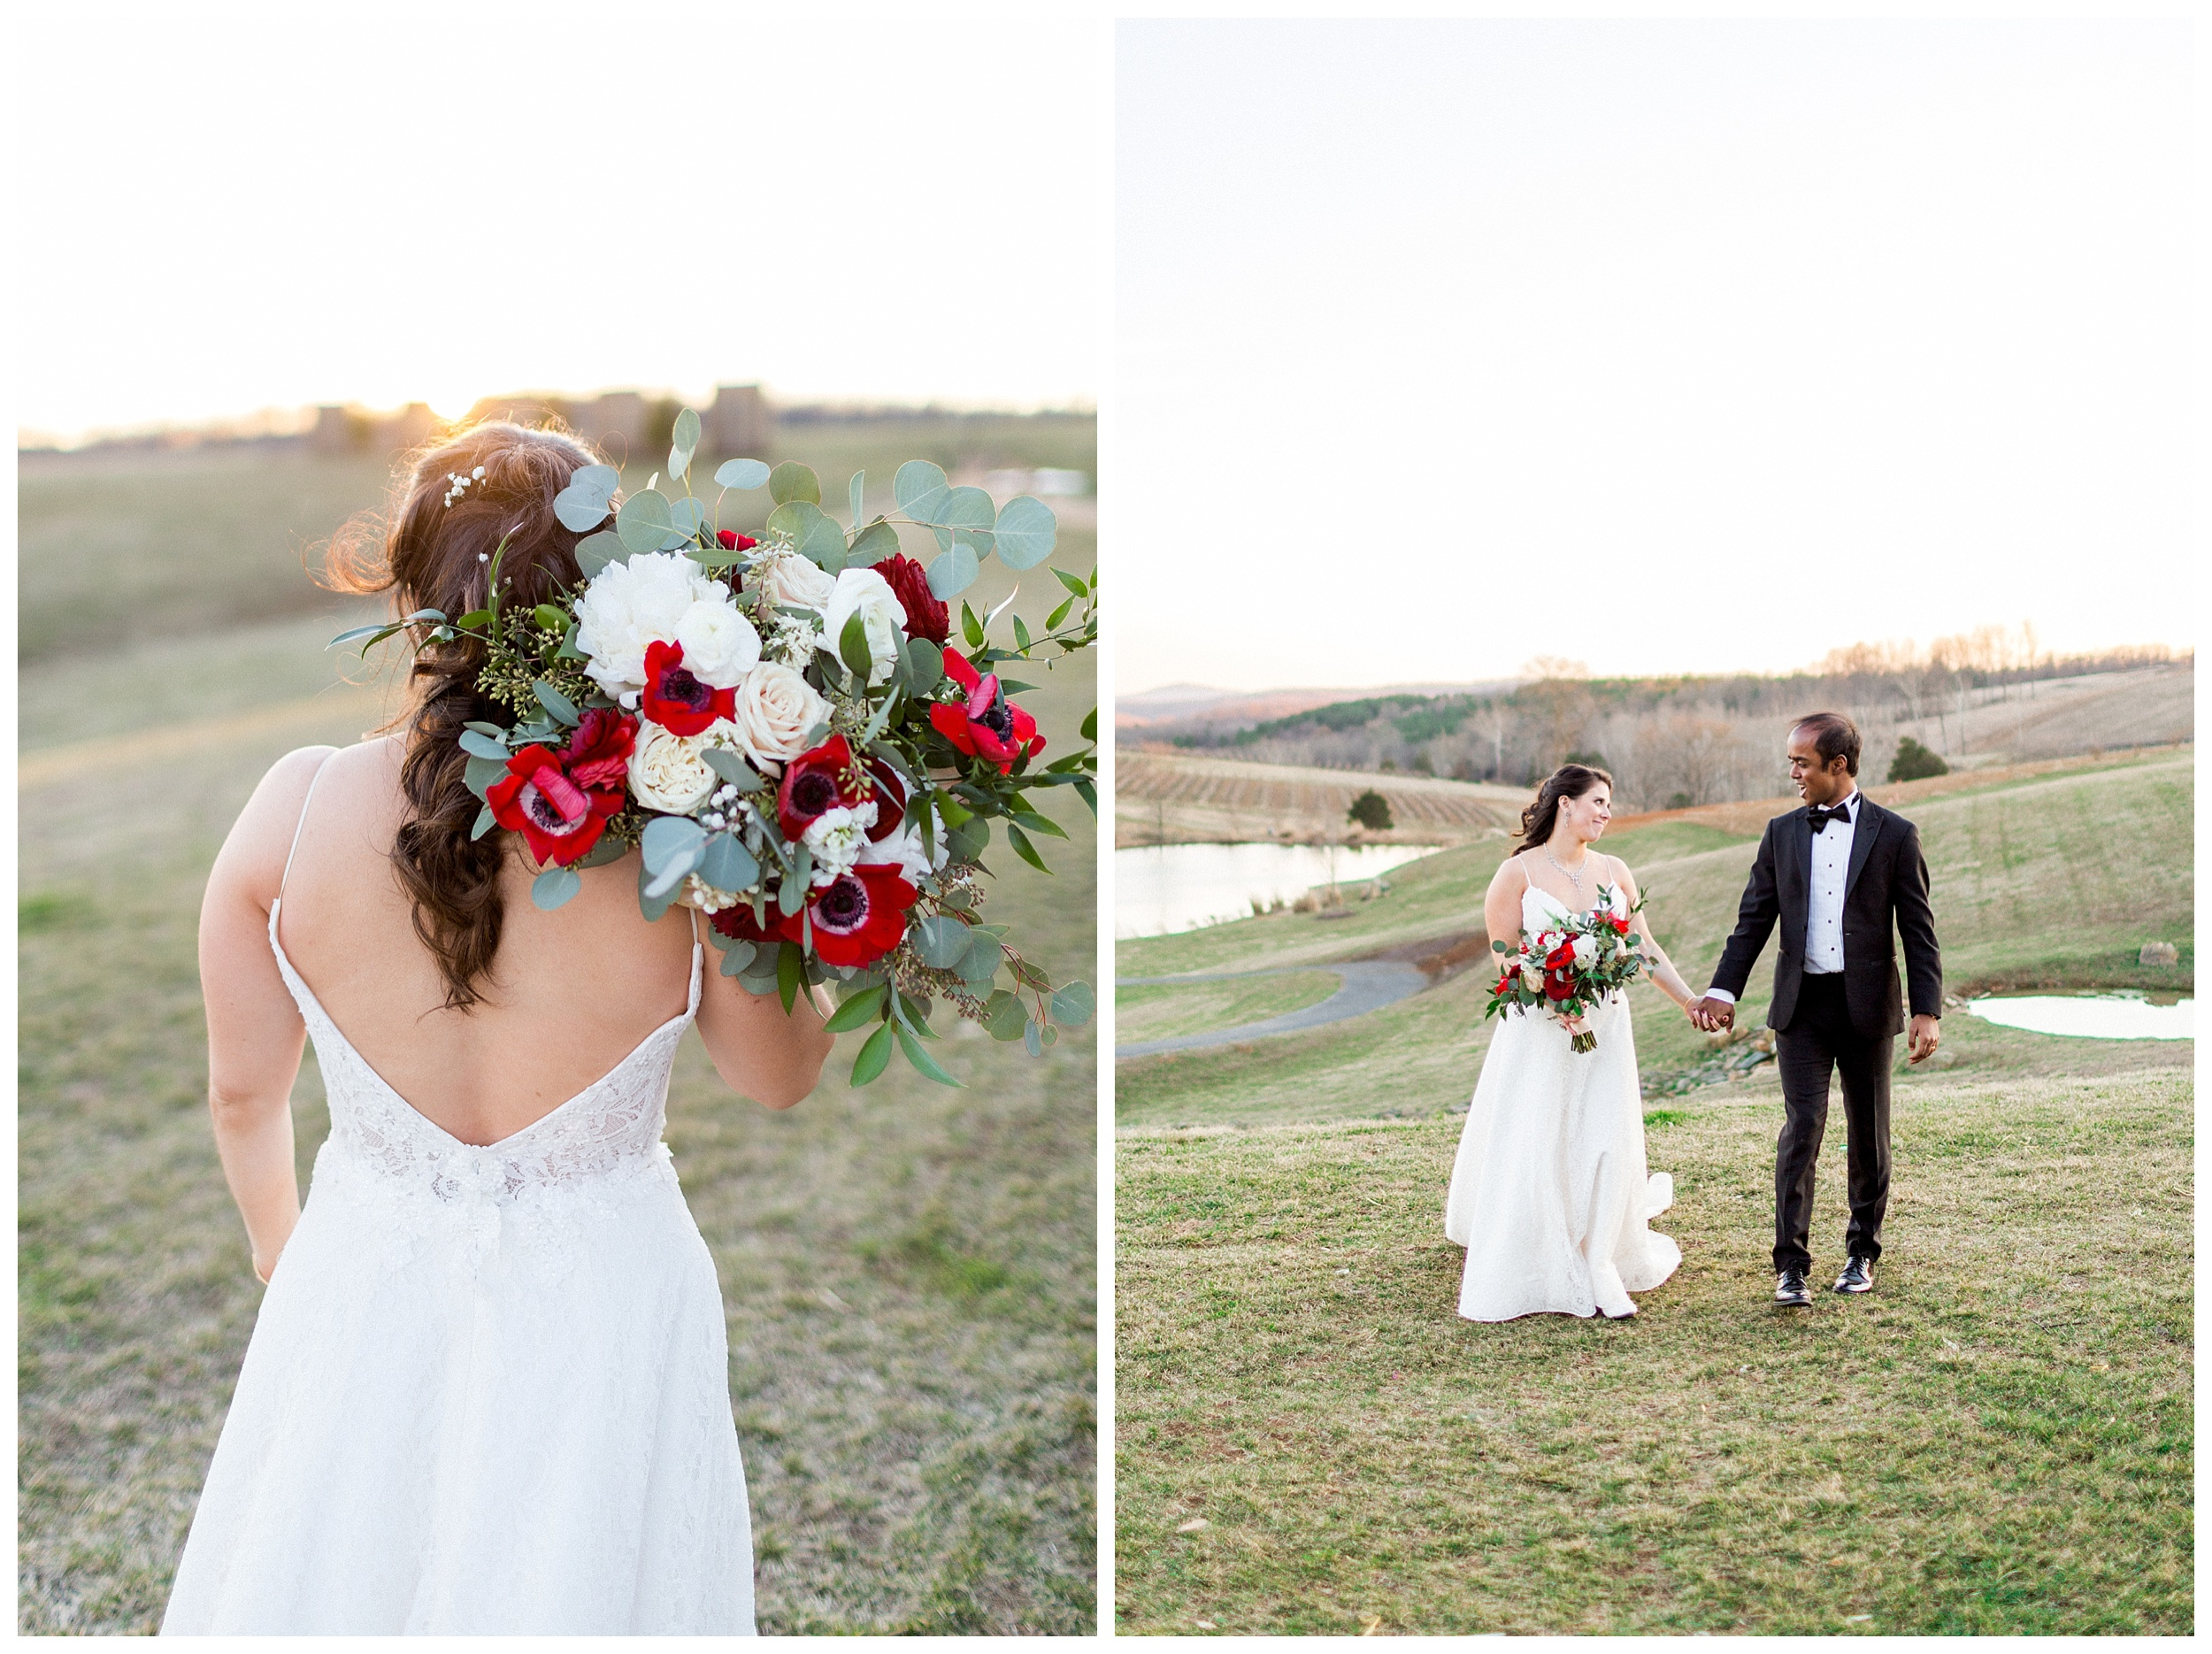 Stone Tower Winery Wedding | Virginia Winter Wedding | VA Wedding Photographer Kir Tuben_0103.jpg